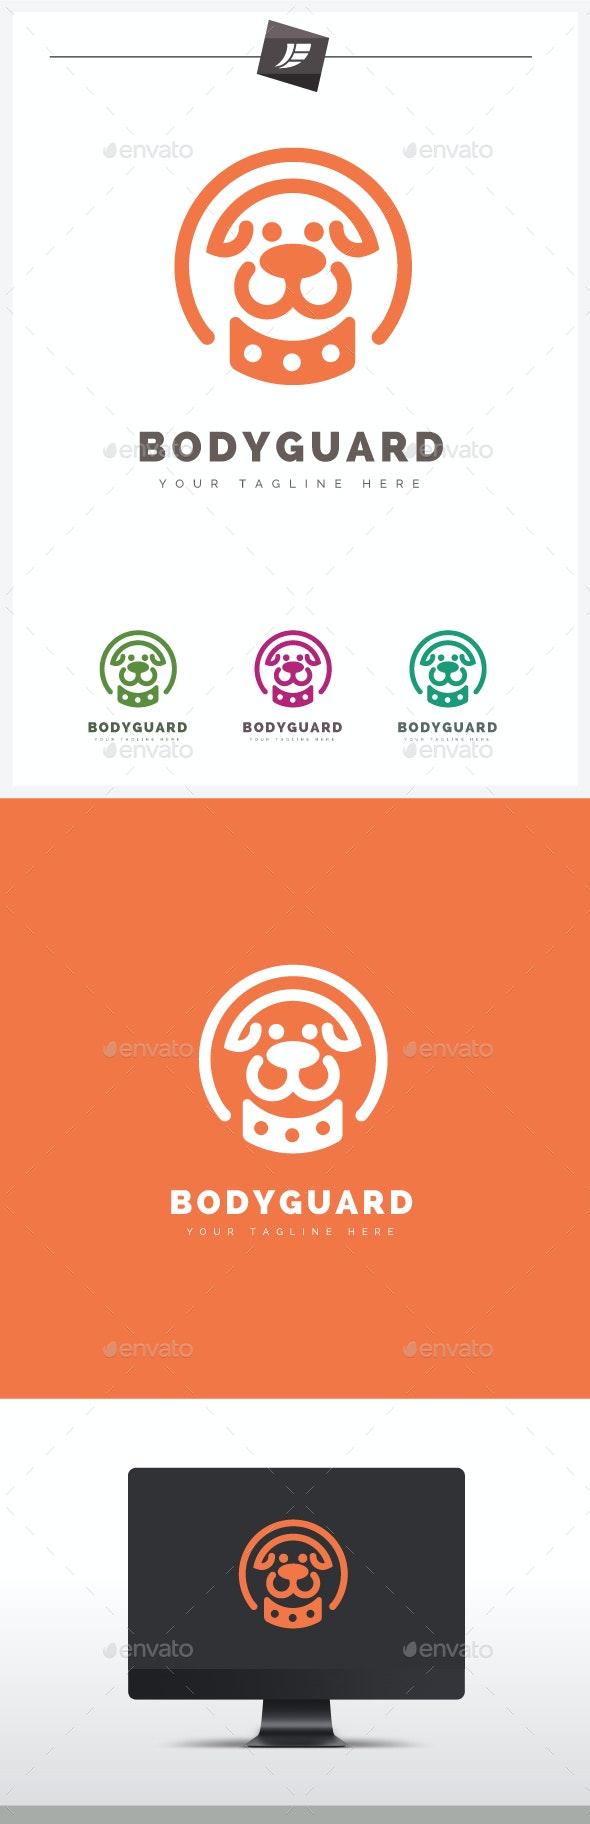 Bodyguard Dog Logo - Animals Logo Templates